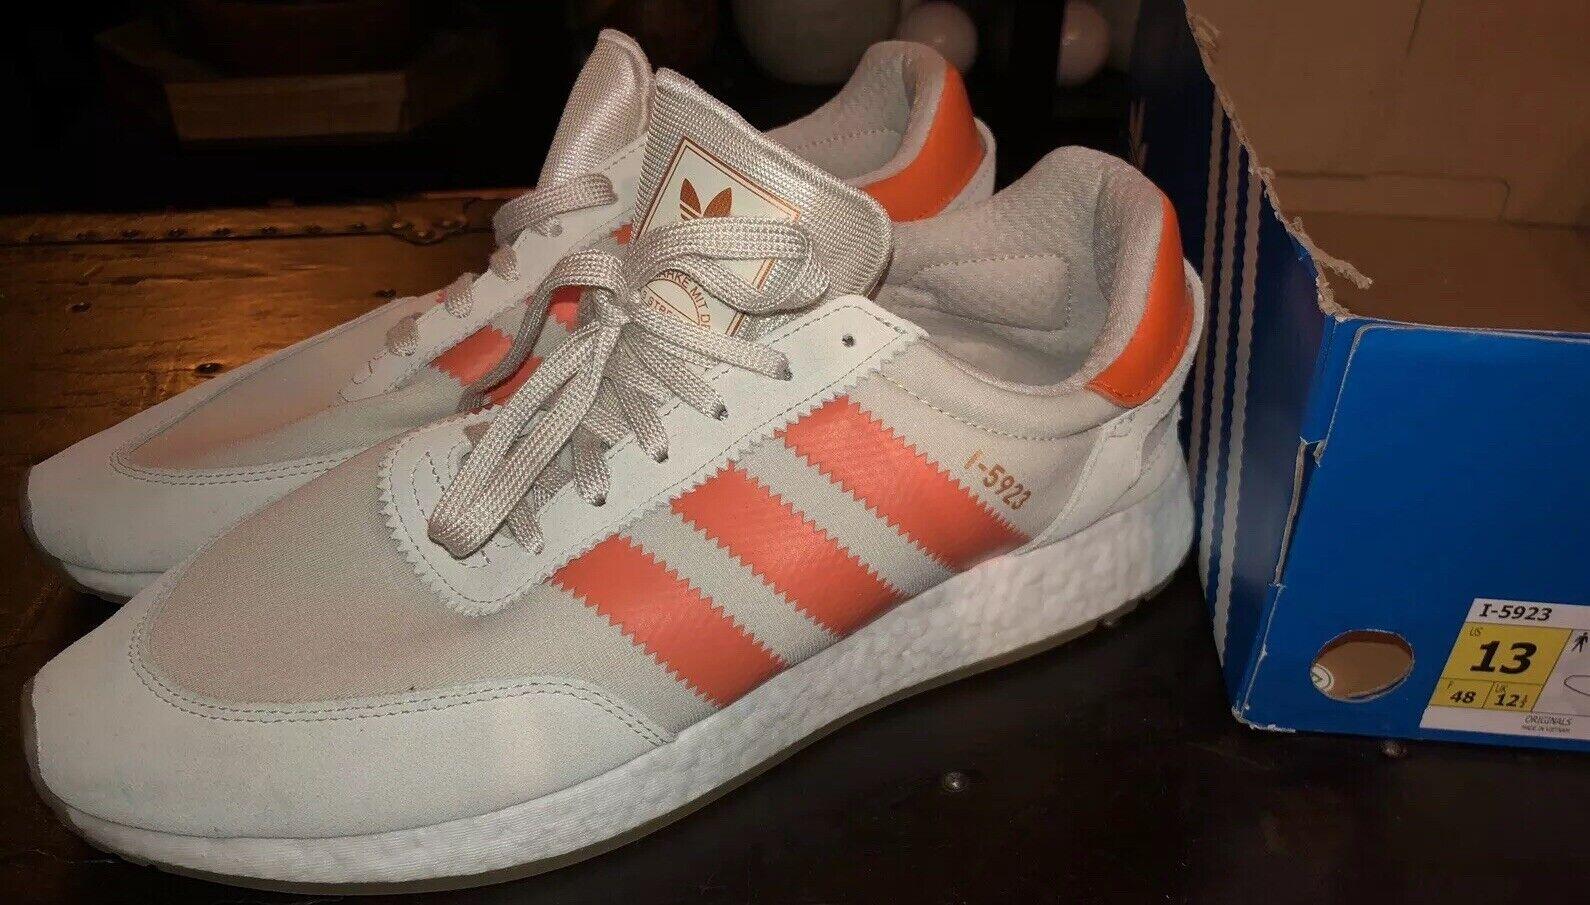 Adidas I-5923 BB9495 Men's 13